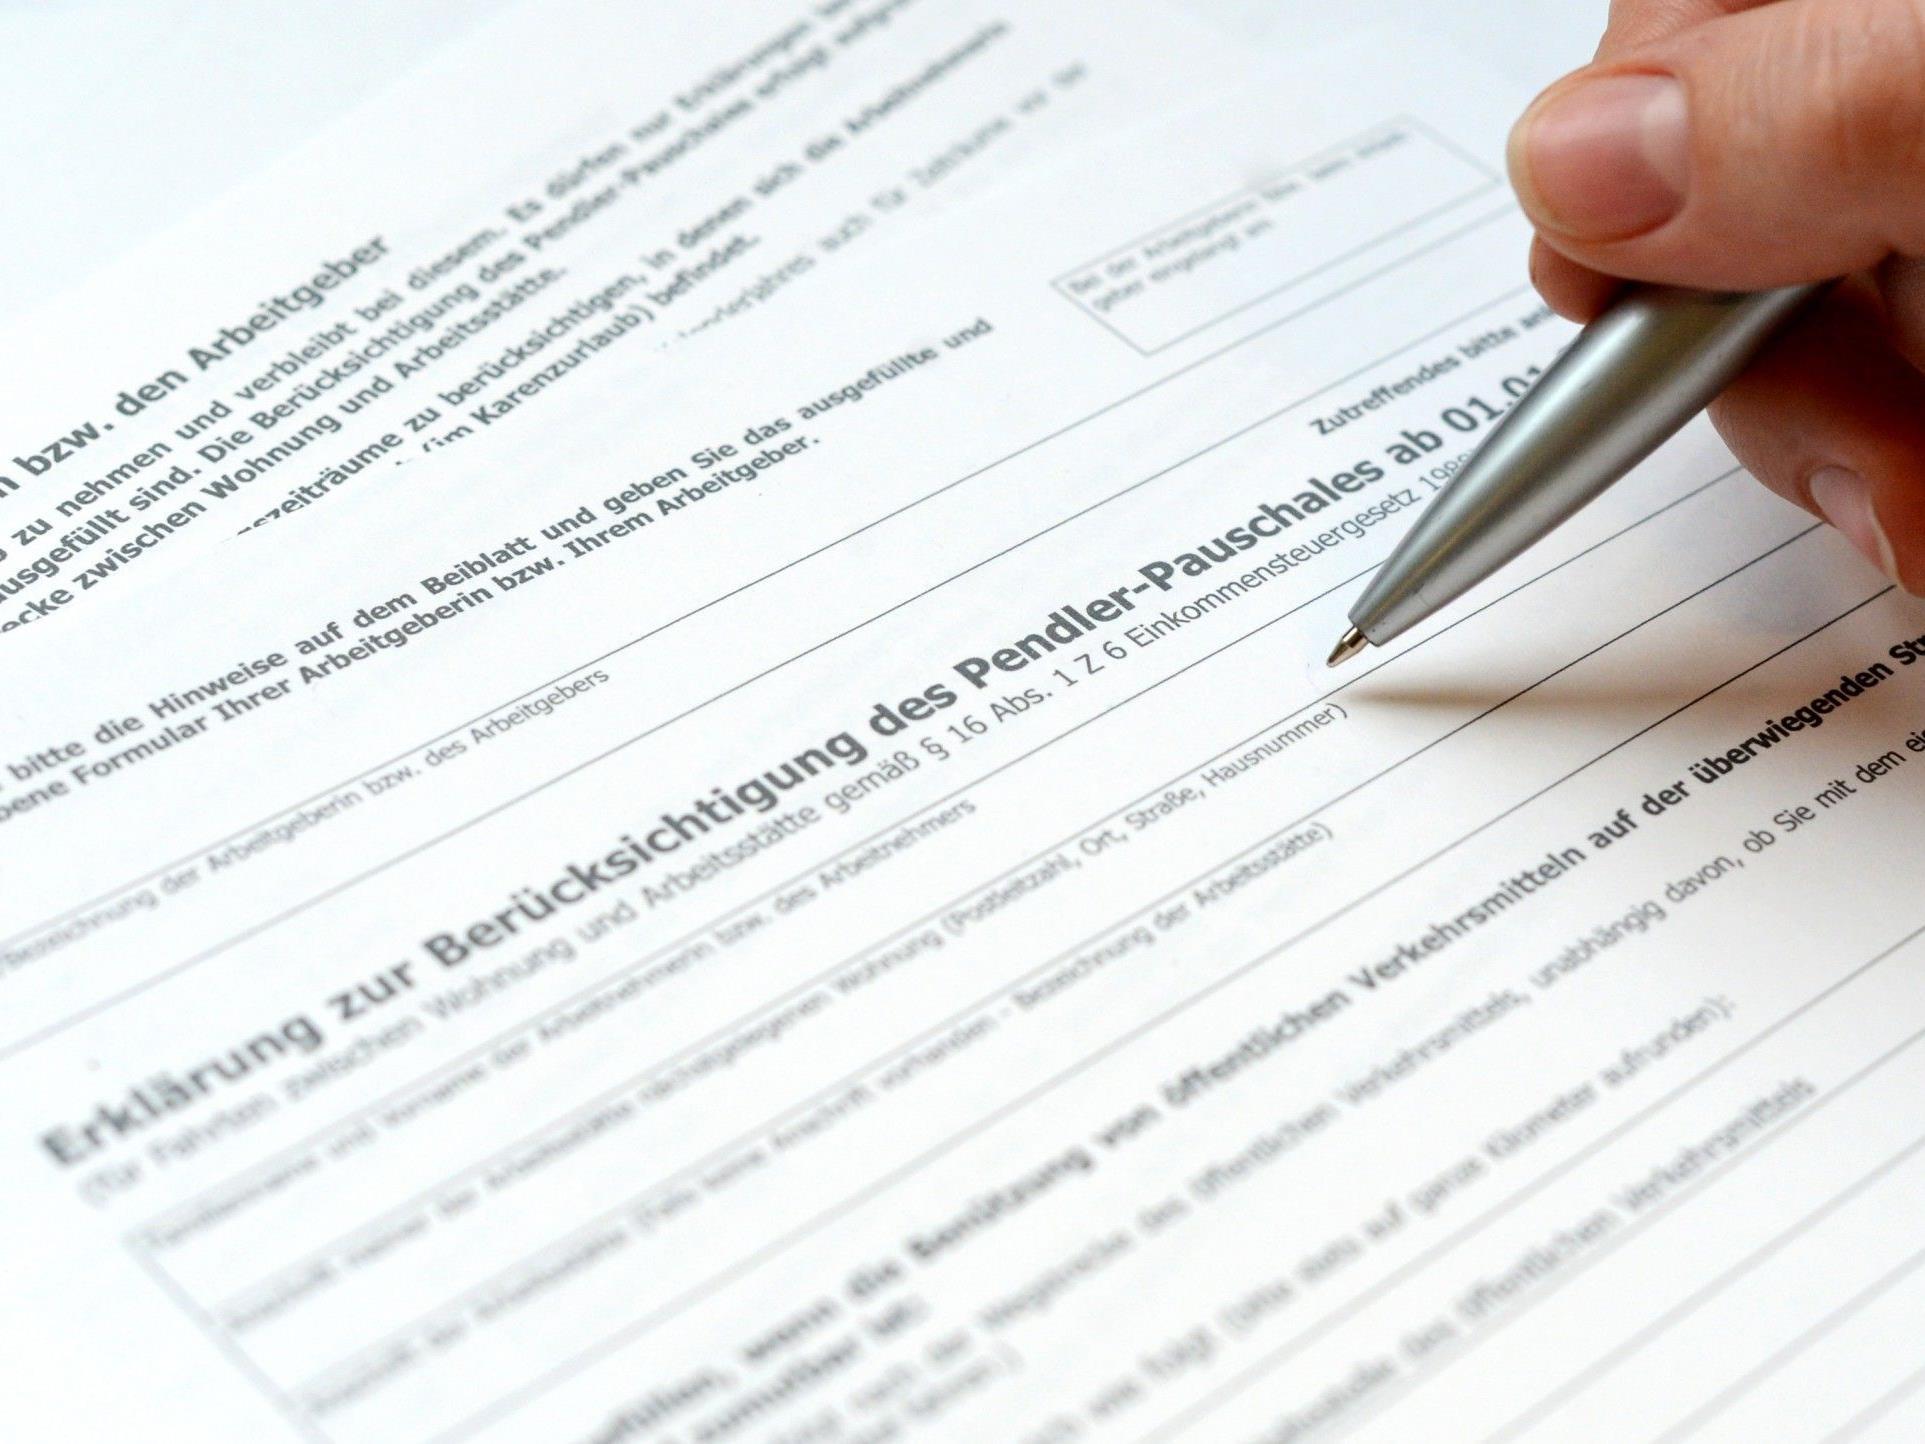 Finanzierung laut Finanzministerium gesichert - Kritik vom VCÖ.